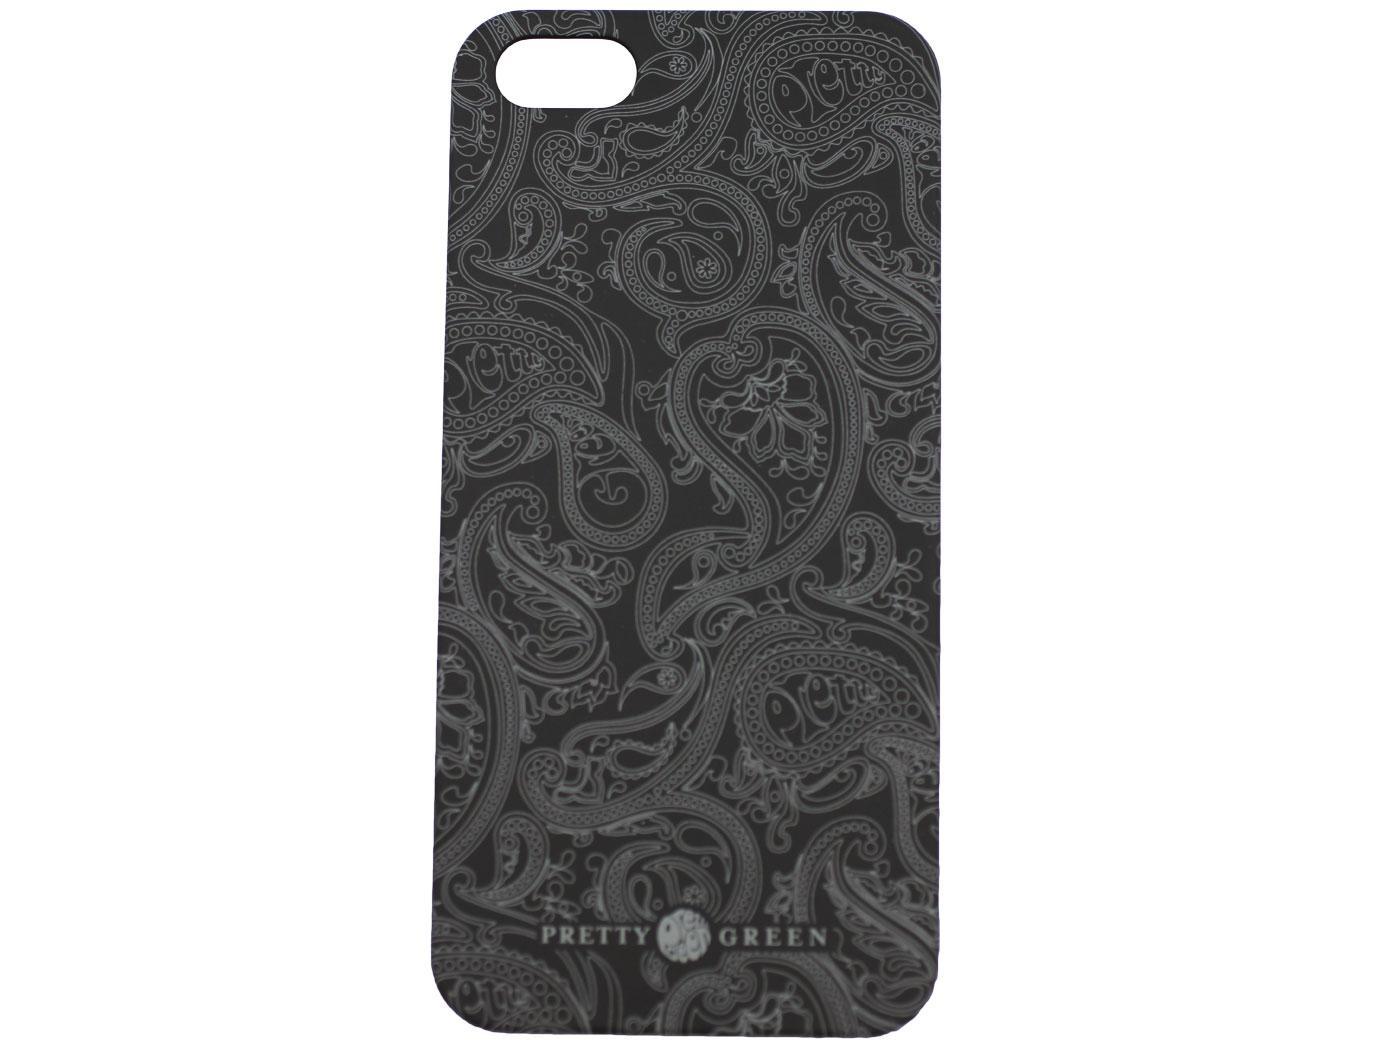 PRETTY GREEN 60s Mod Paisley iPhone 5 Case (BLACK)